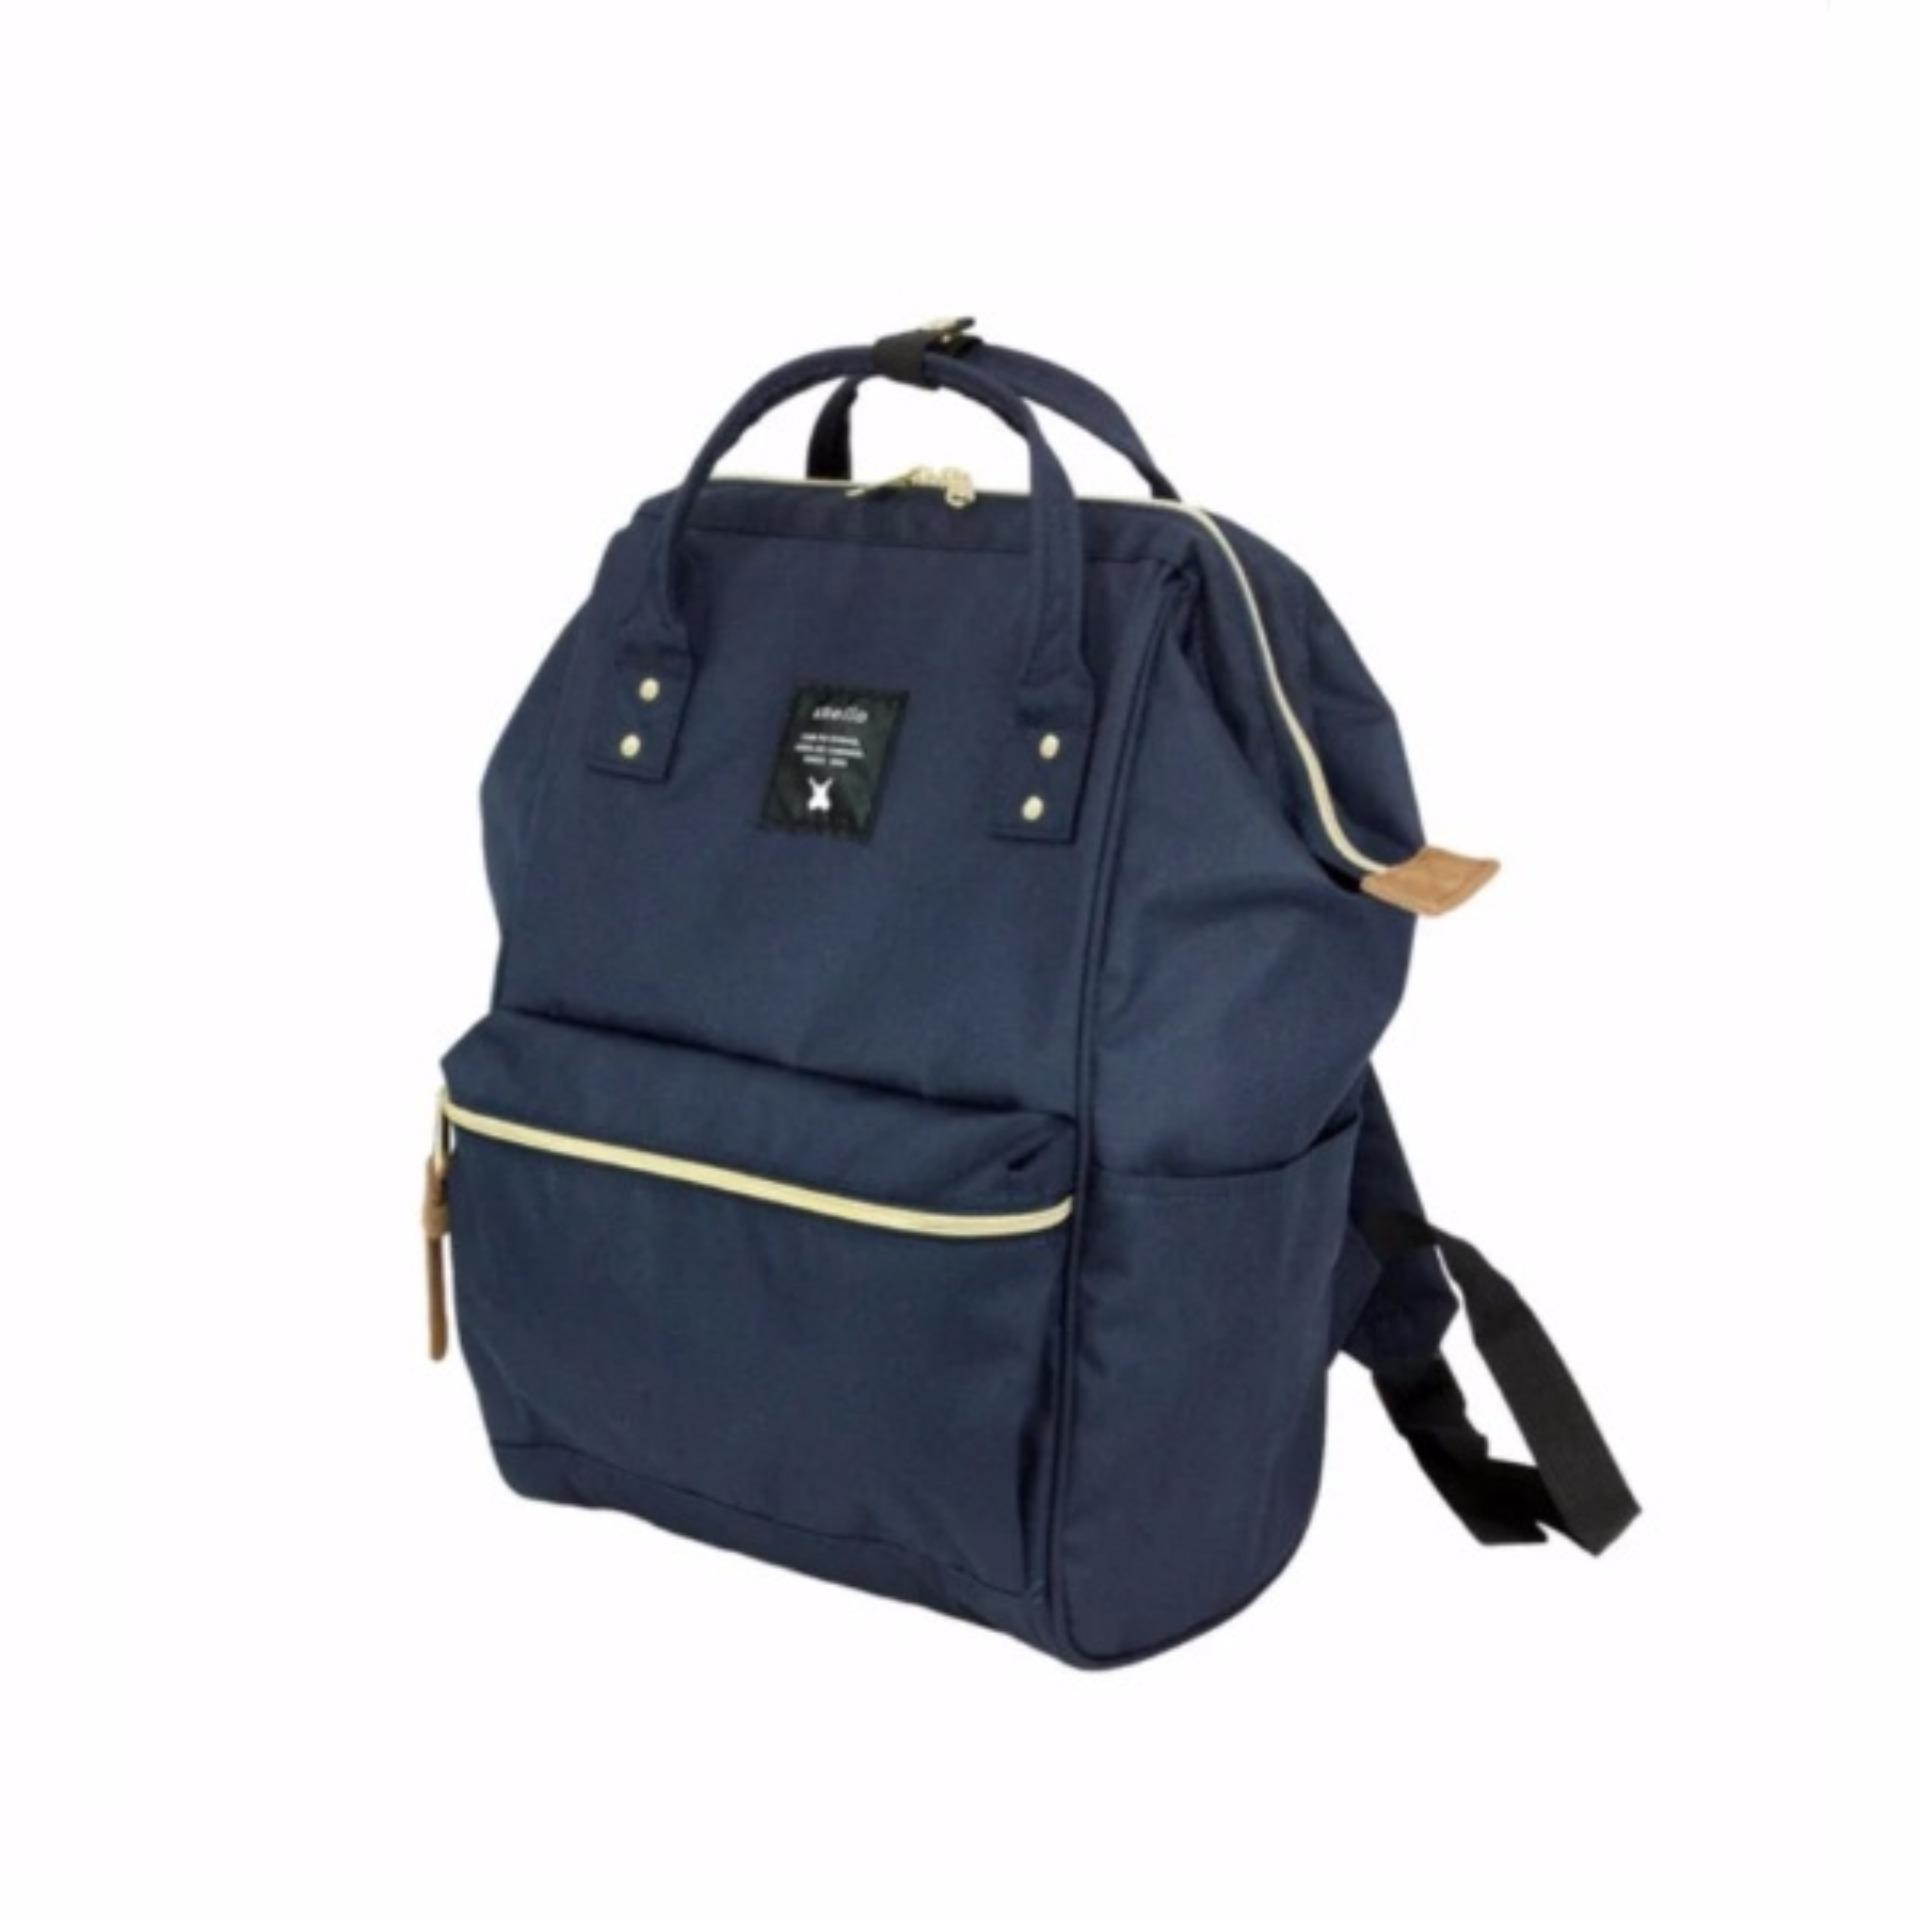 Waterproof Backpack Philippines Click Backpacks